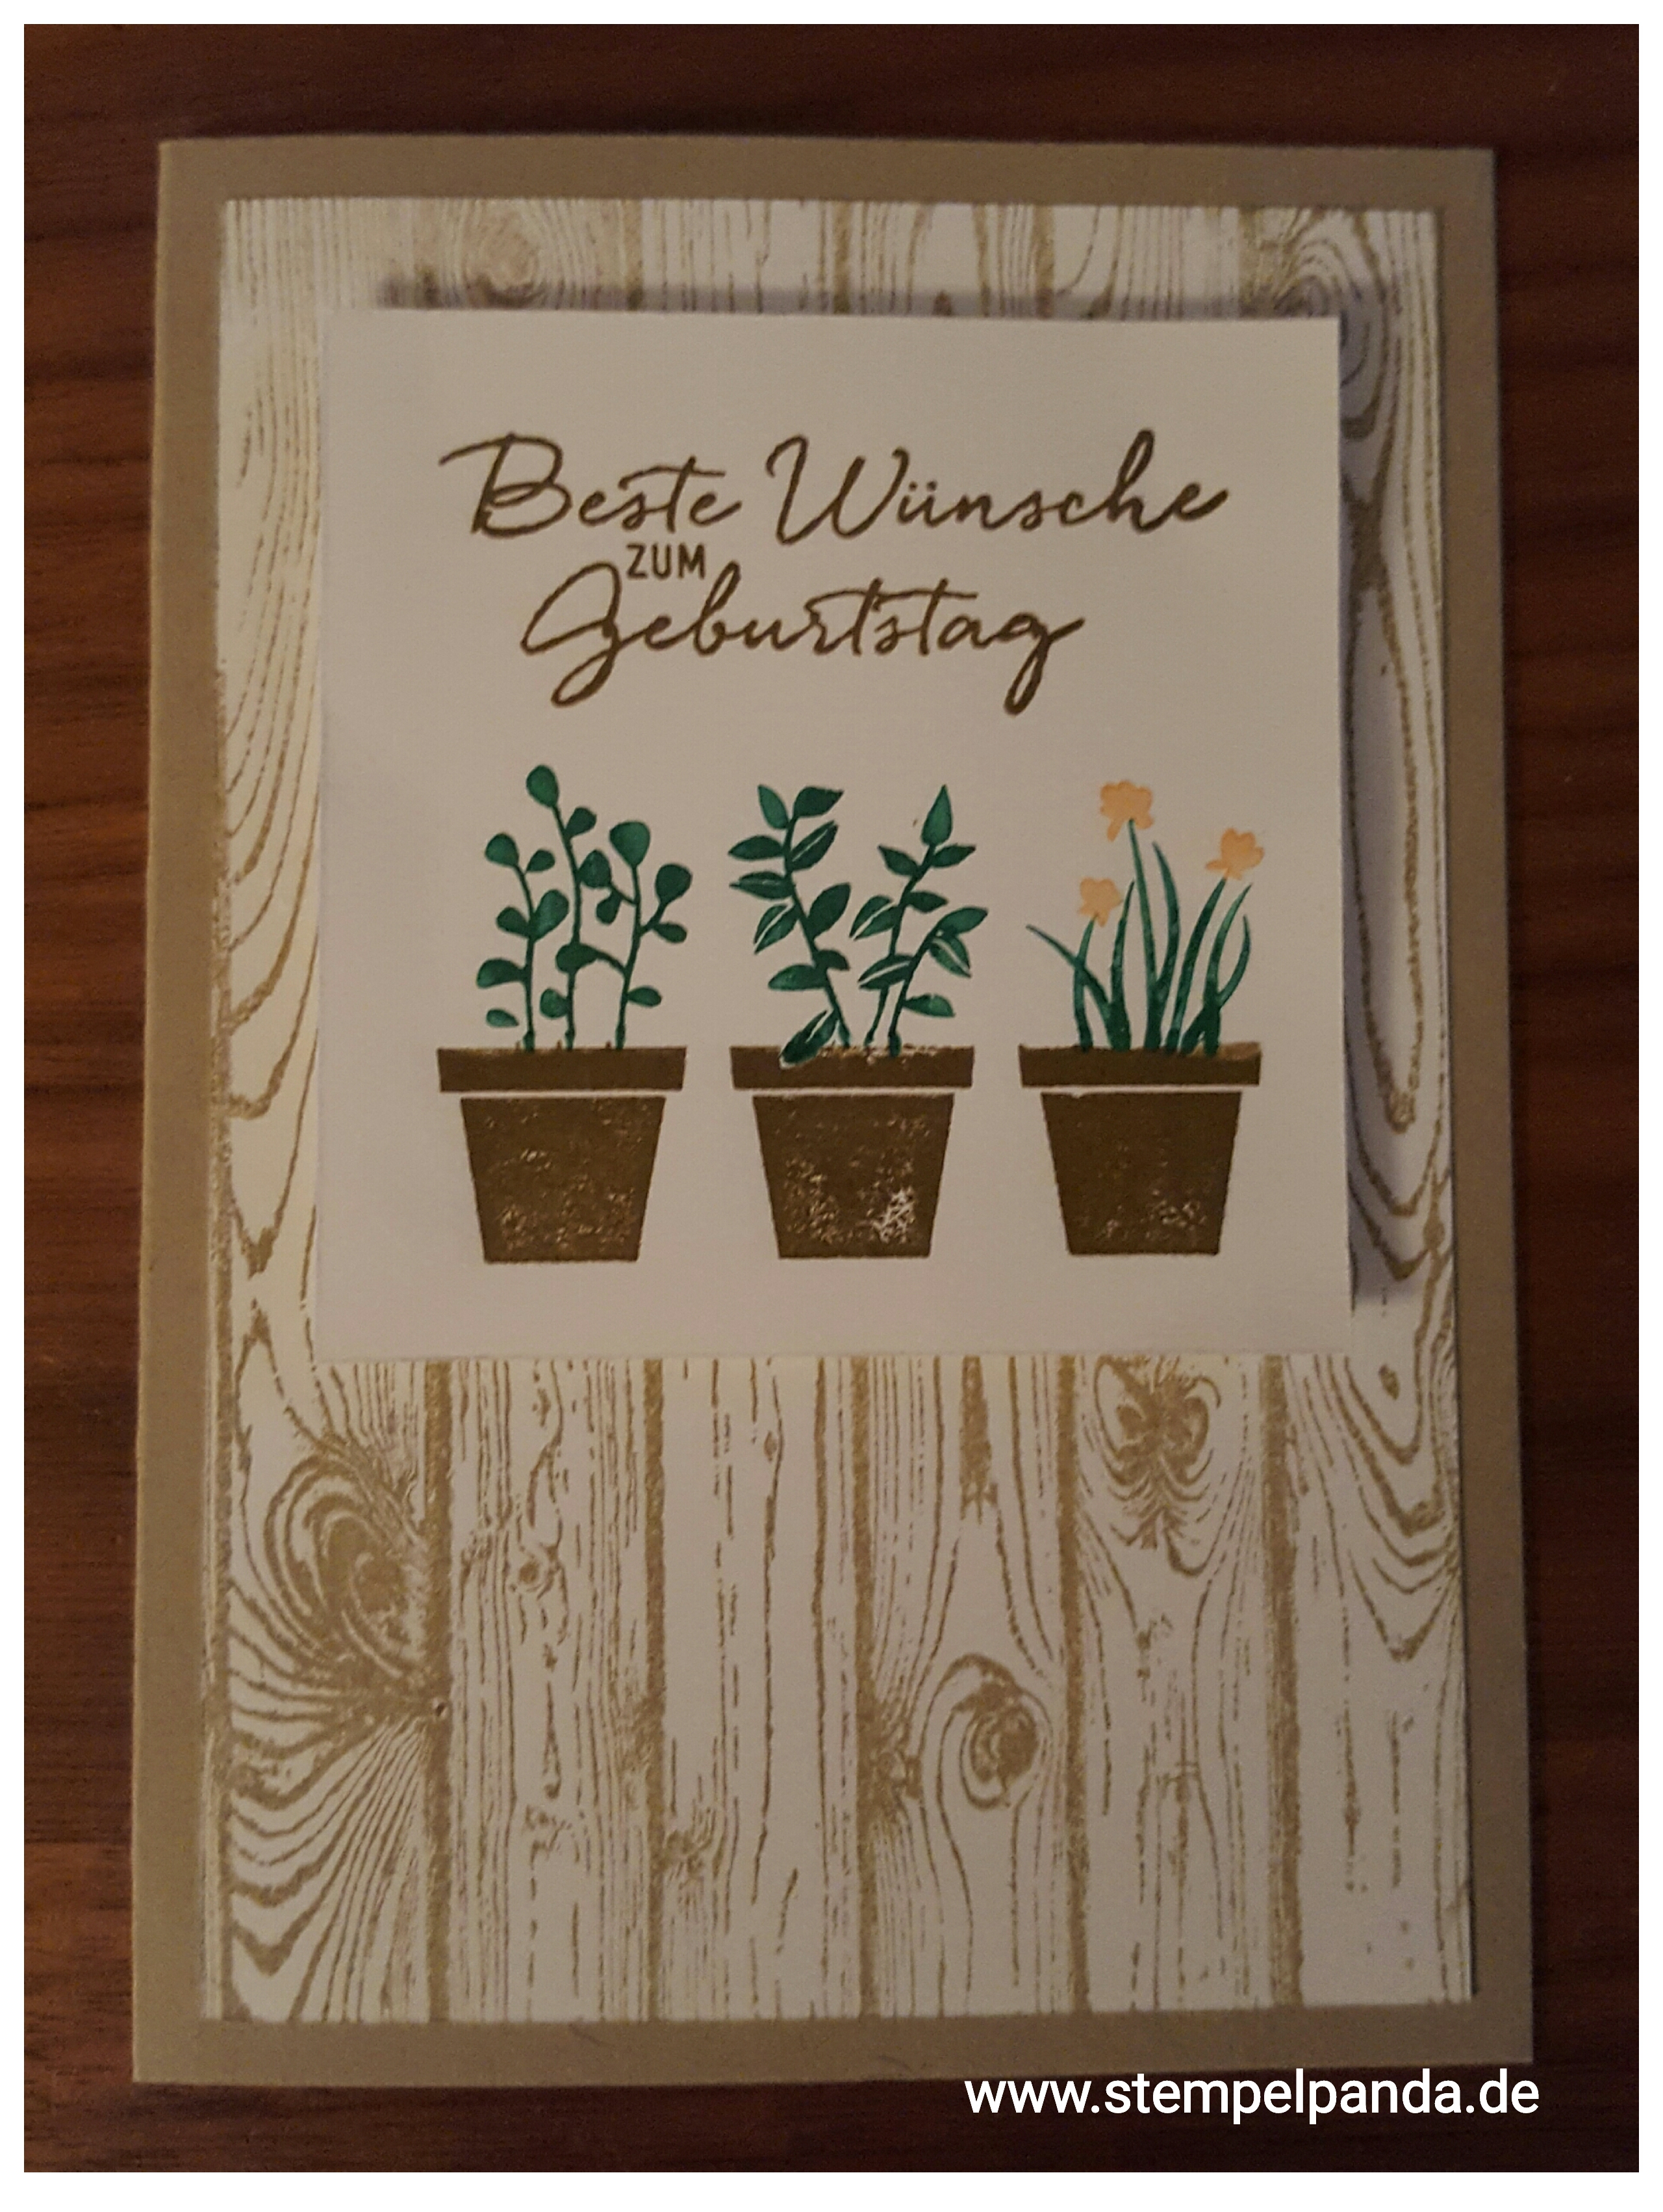 Stampin up stempelpanda gift from the garden geburtstag birthday